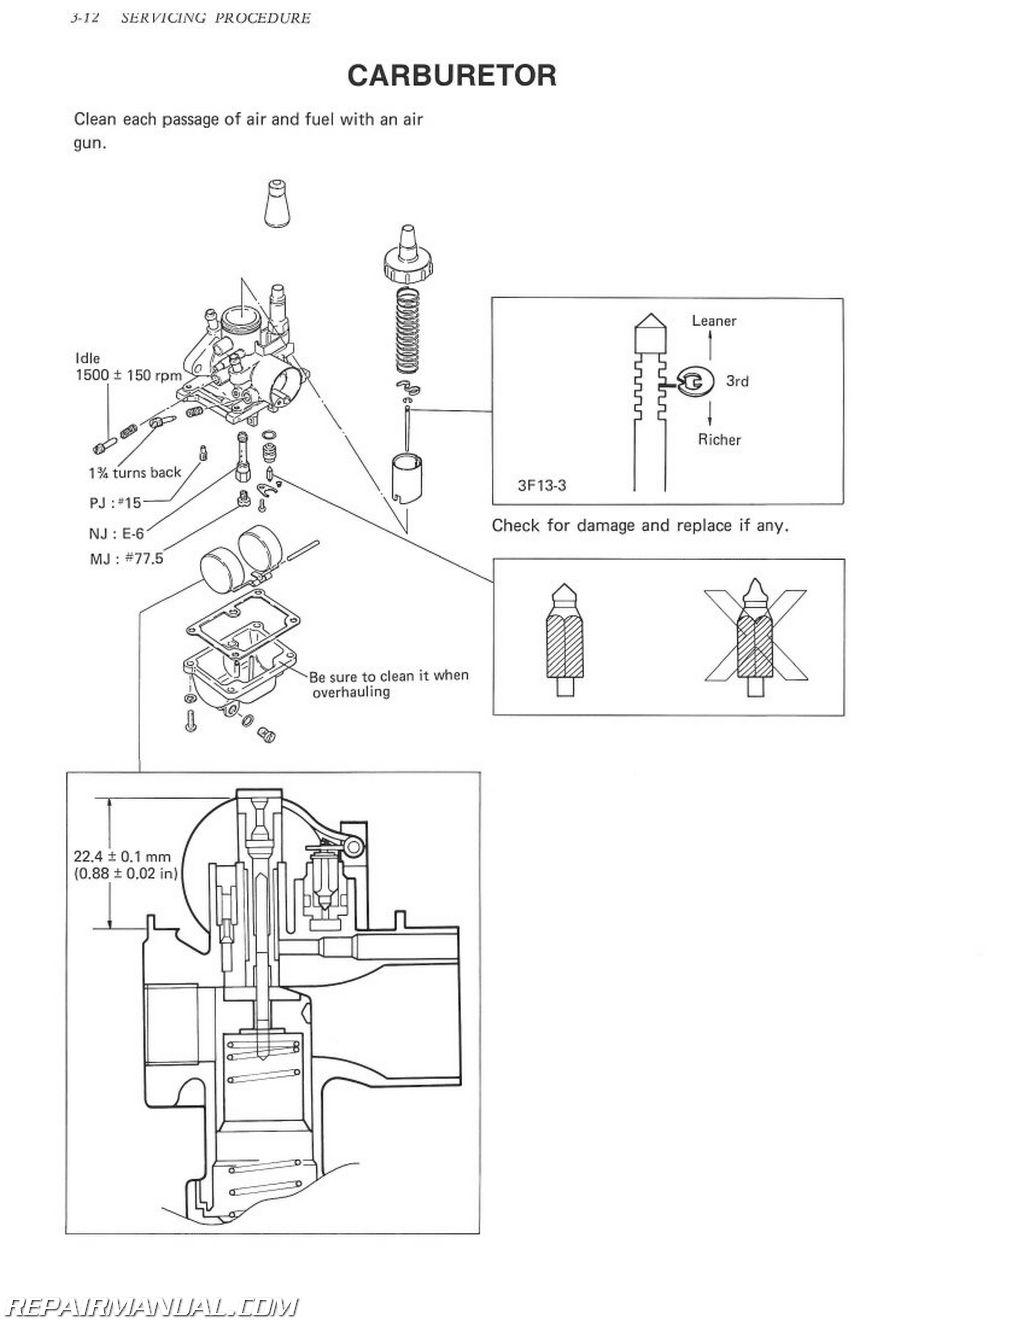 1980-1991 Suzuki FA50 Moped Service Manual